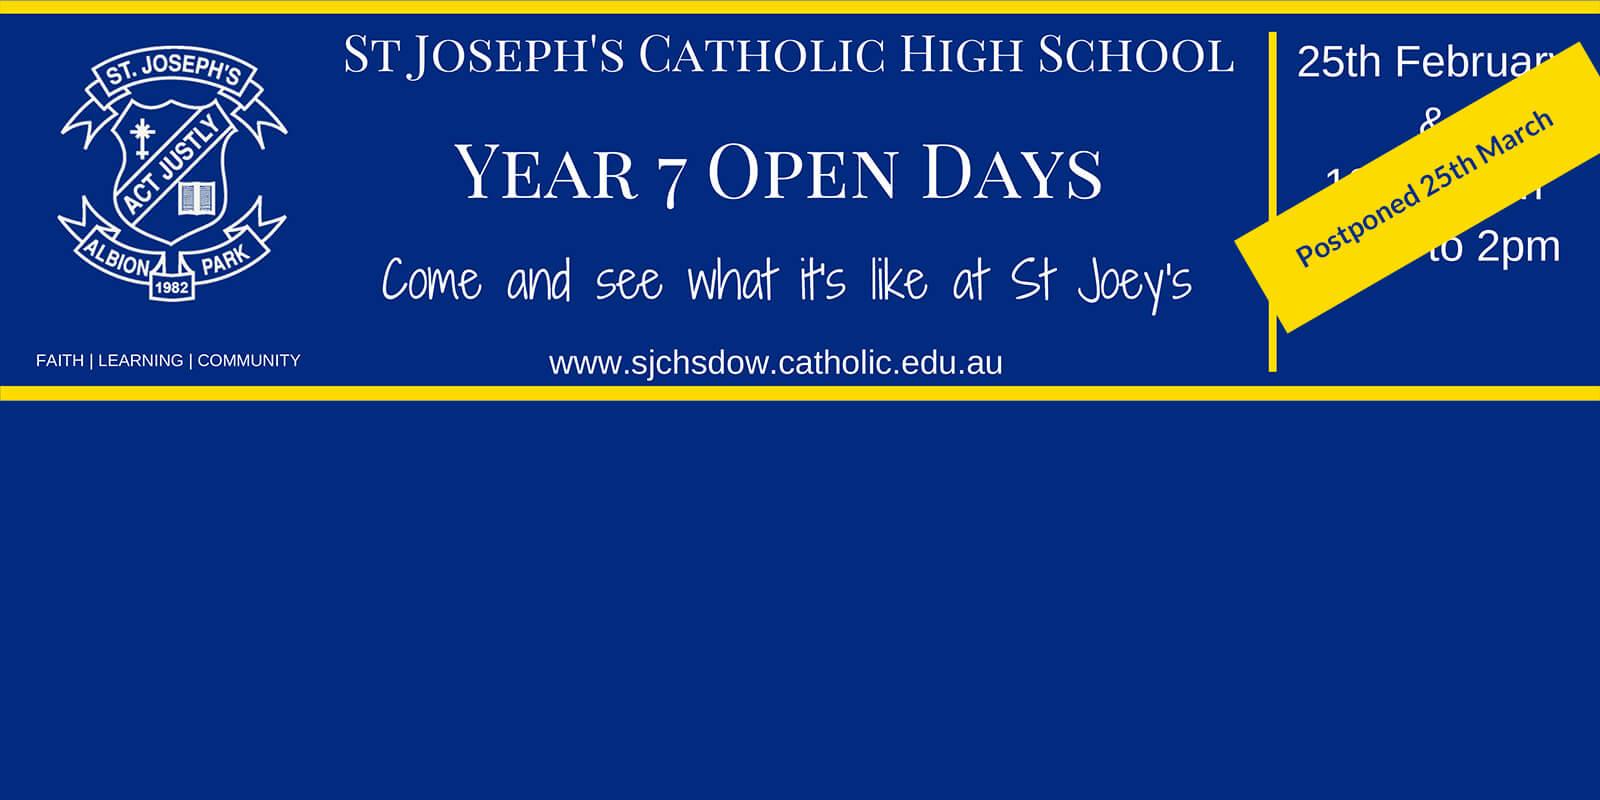 Year 7 Open Days